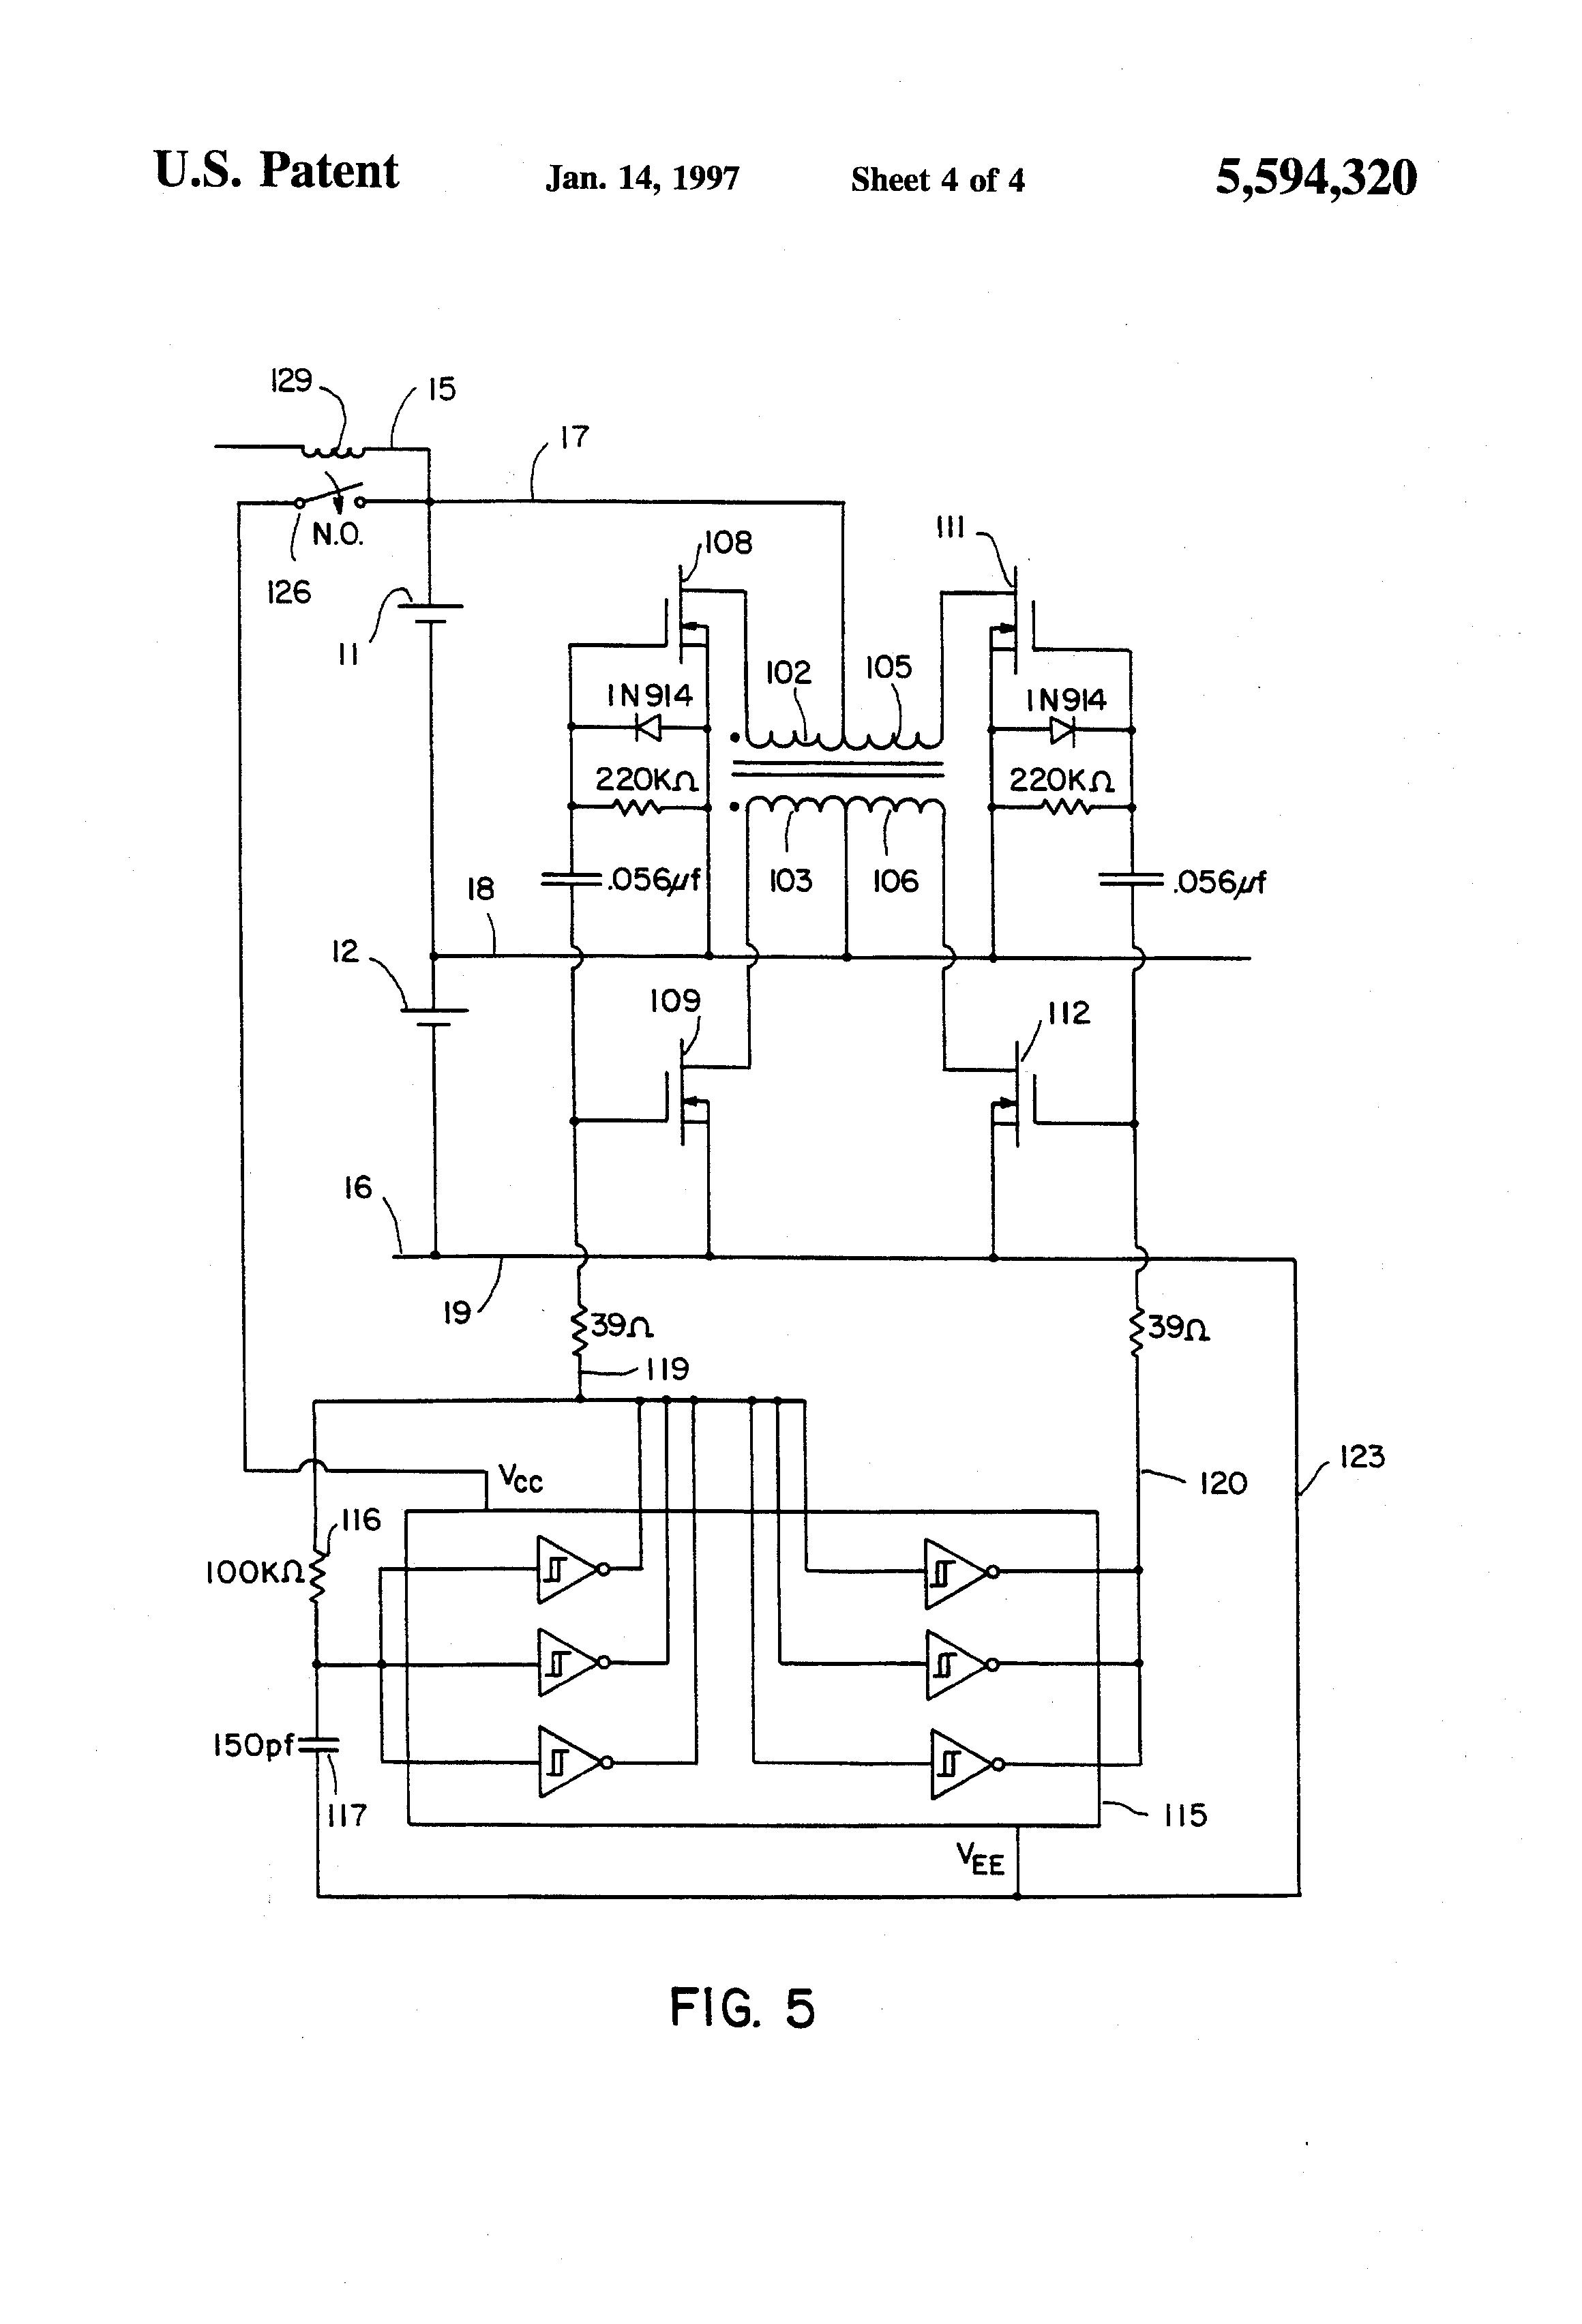 ltd guitars wiring diagrams for amazoncom equalizer audio | upcomingcarshq.com samick guitars wiring diagrams